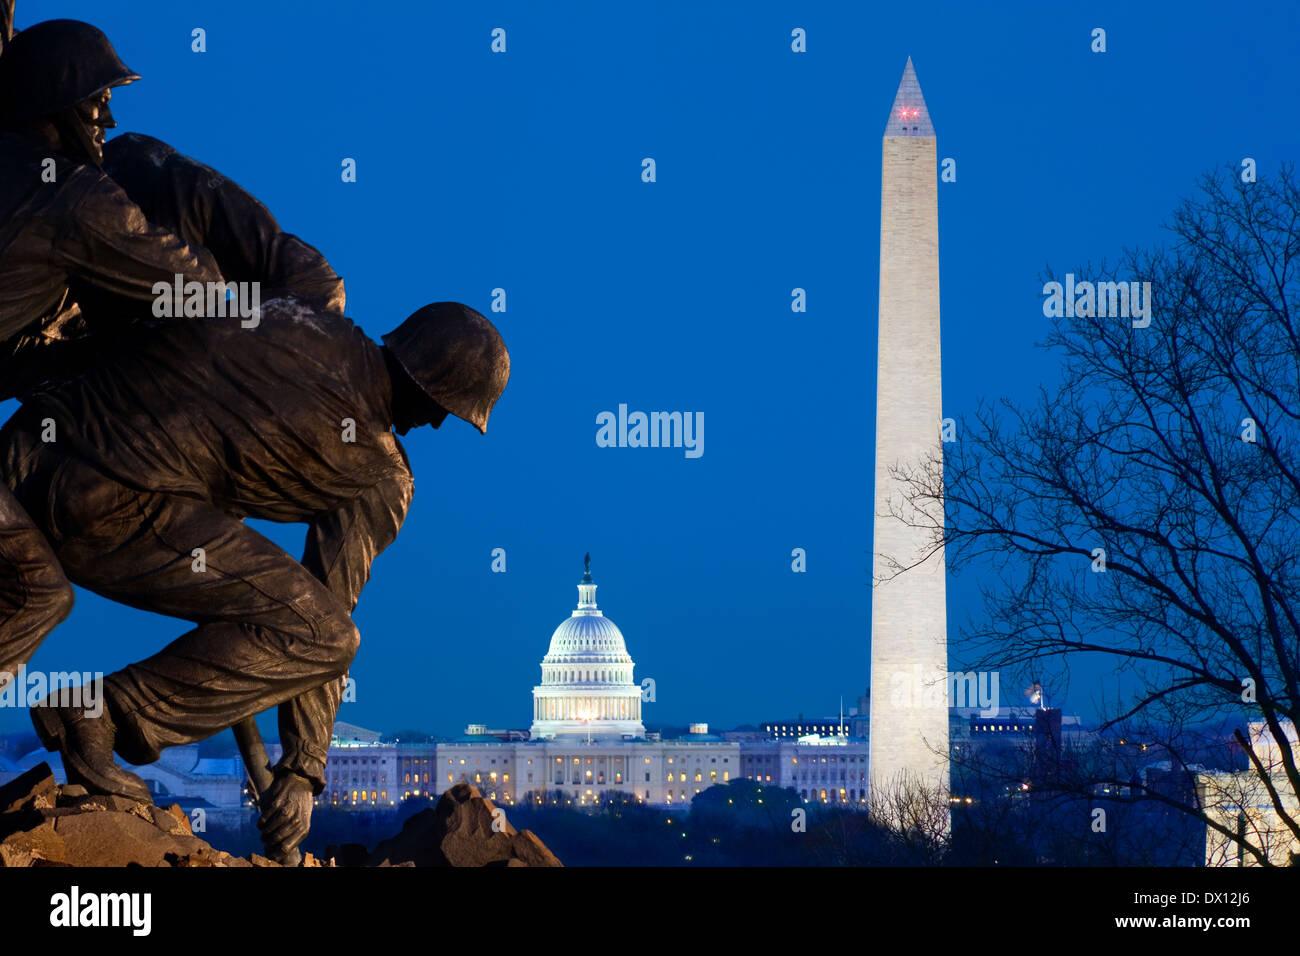 arlington-marine-corps-war-memorial-or-iwo-jima-flag-statue-dc-skyline-DX12J6.jpg